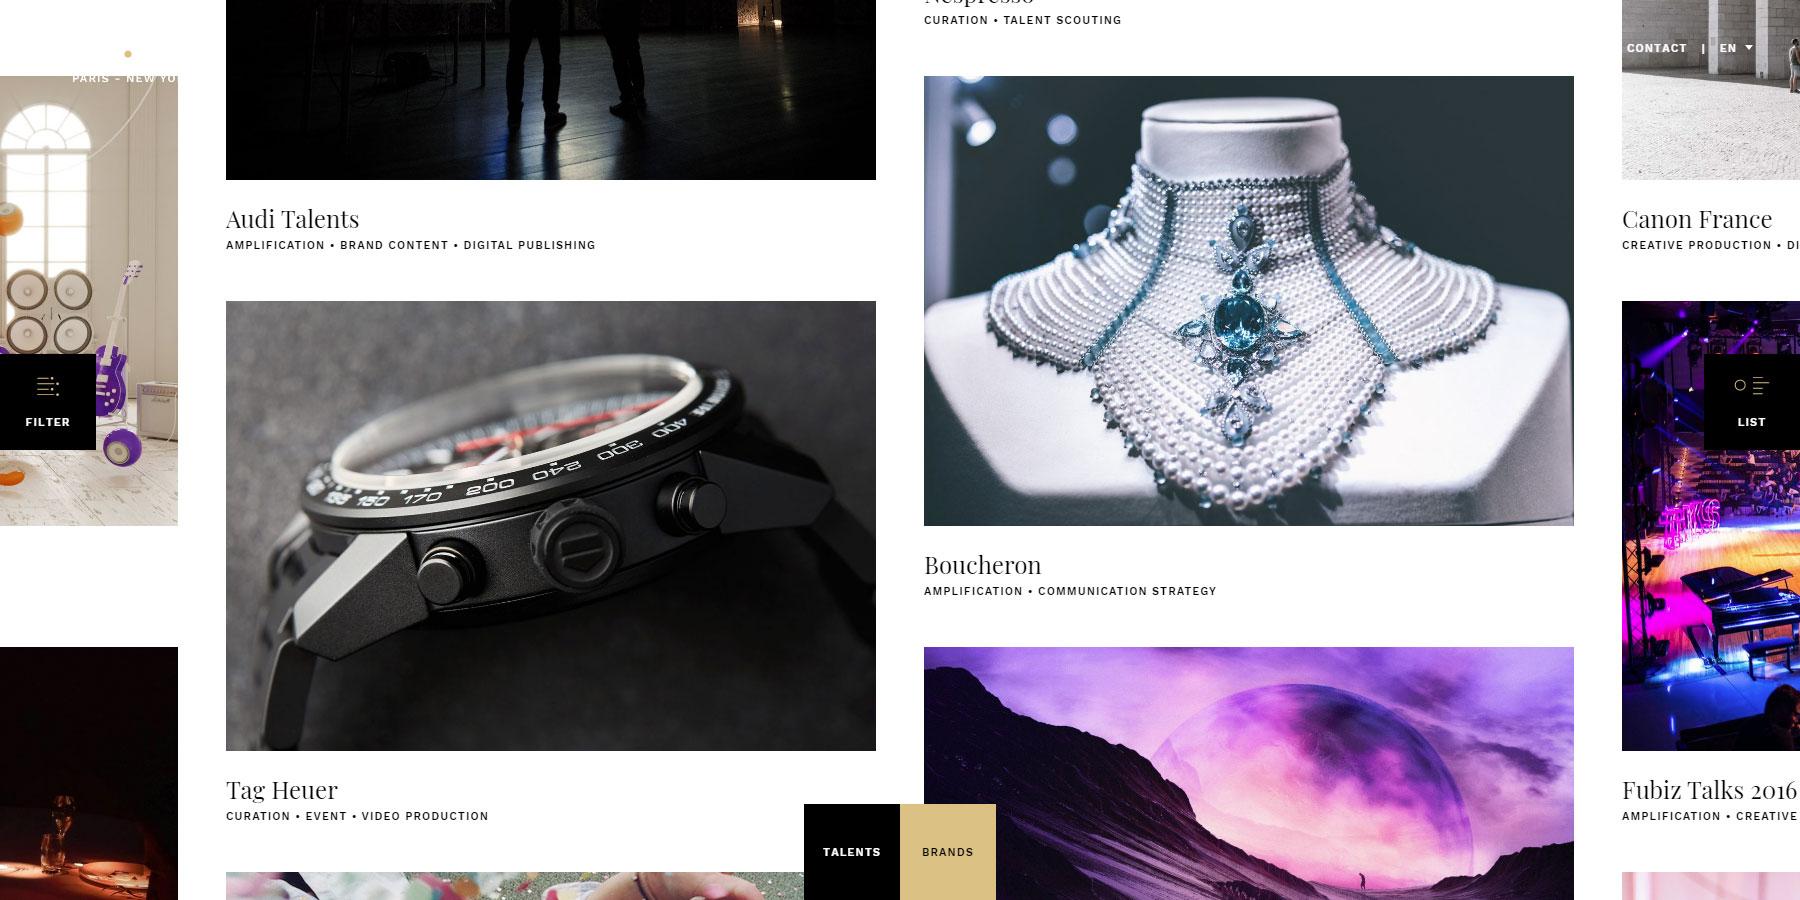 Fubiz Studio - Website of the Day